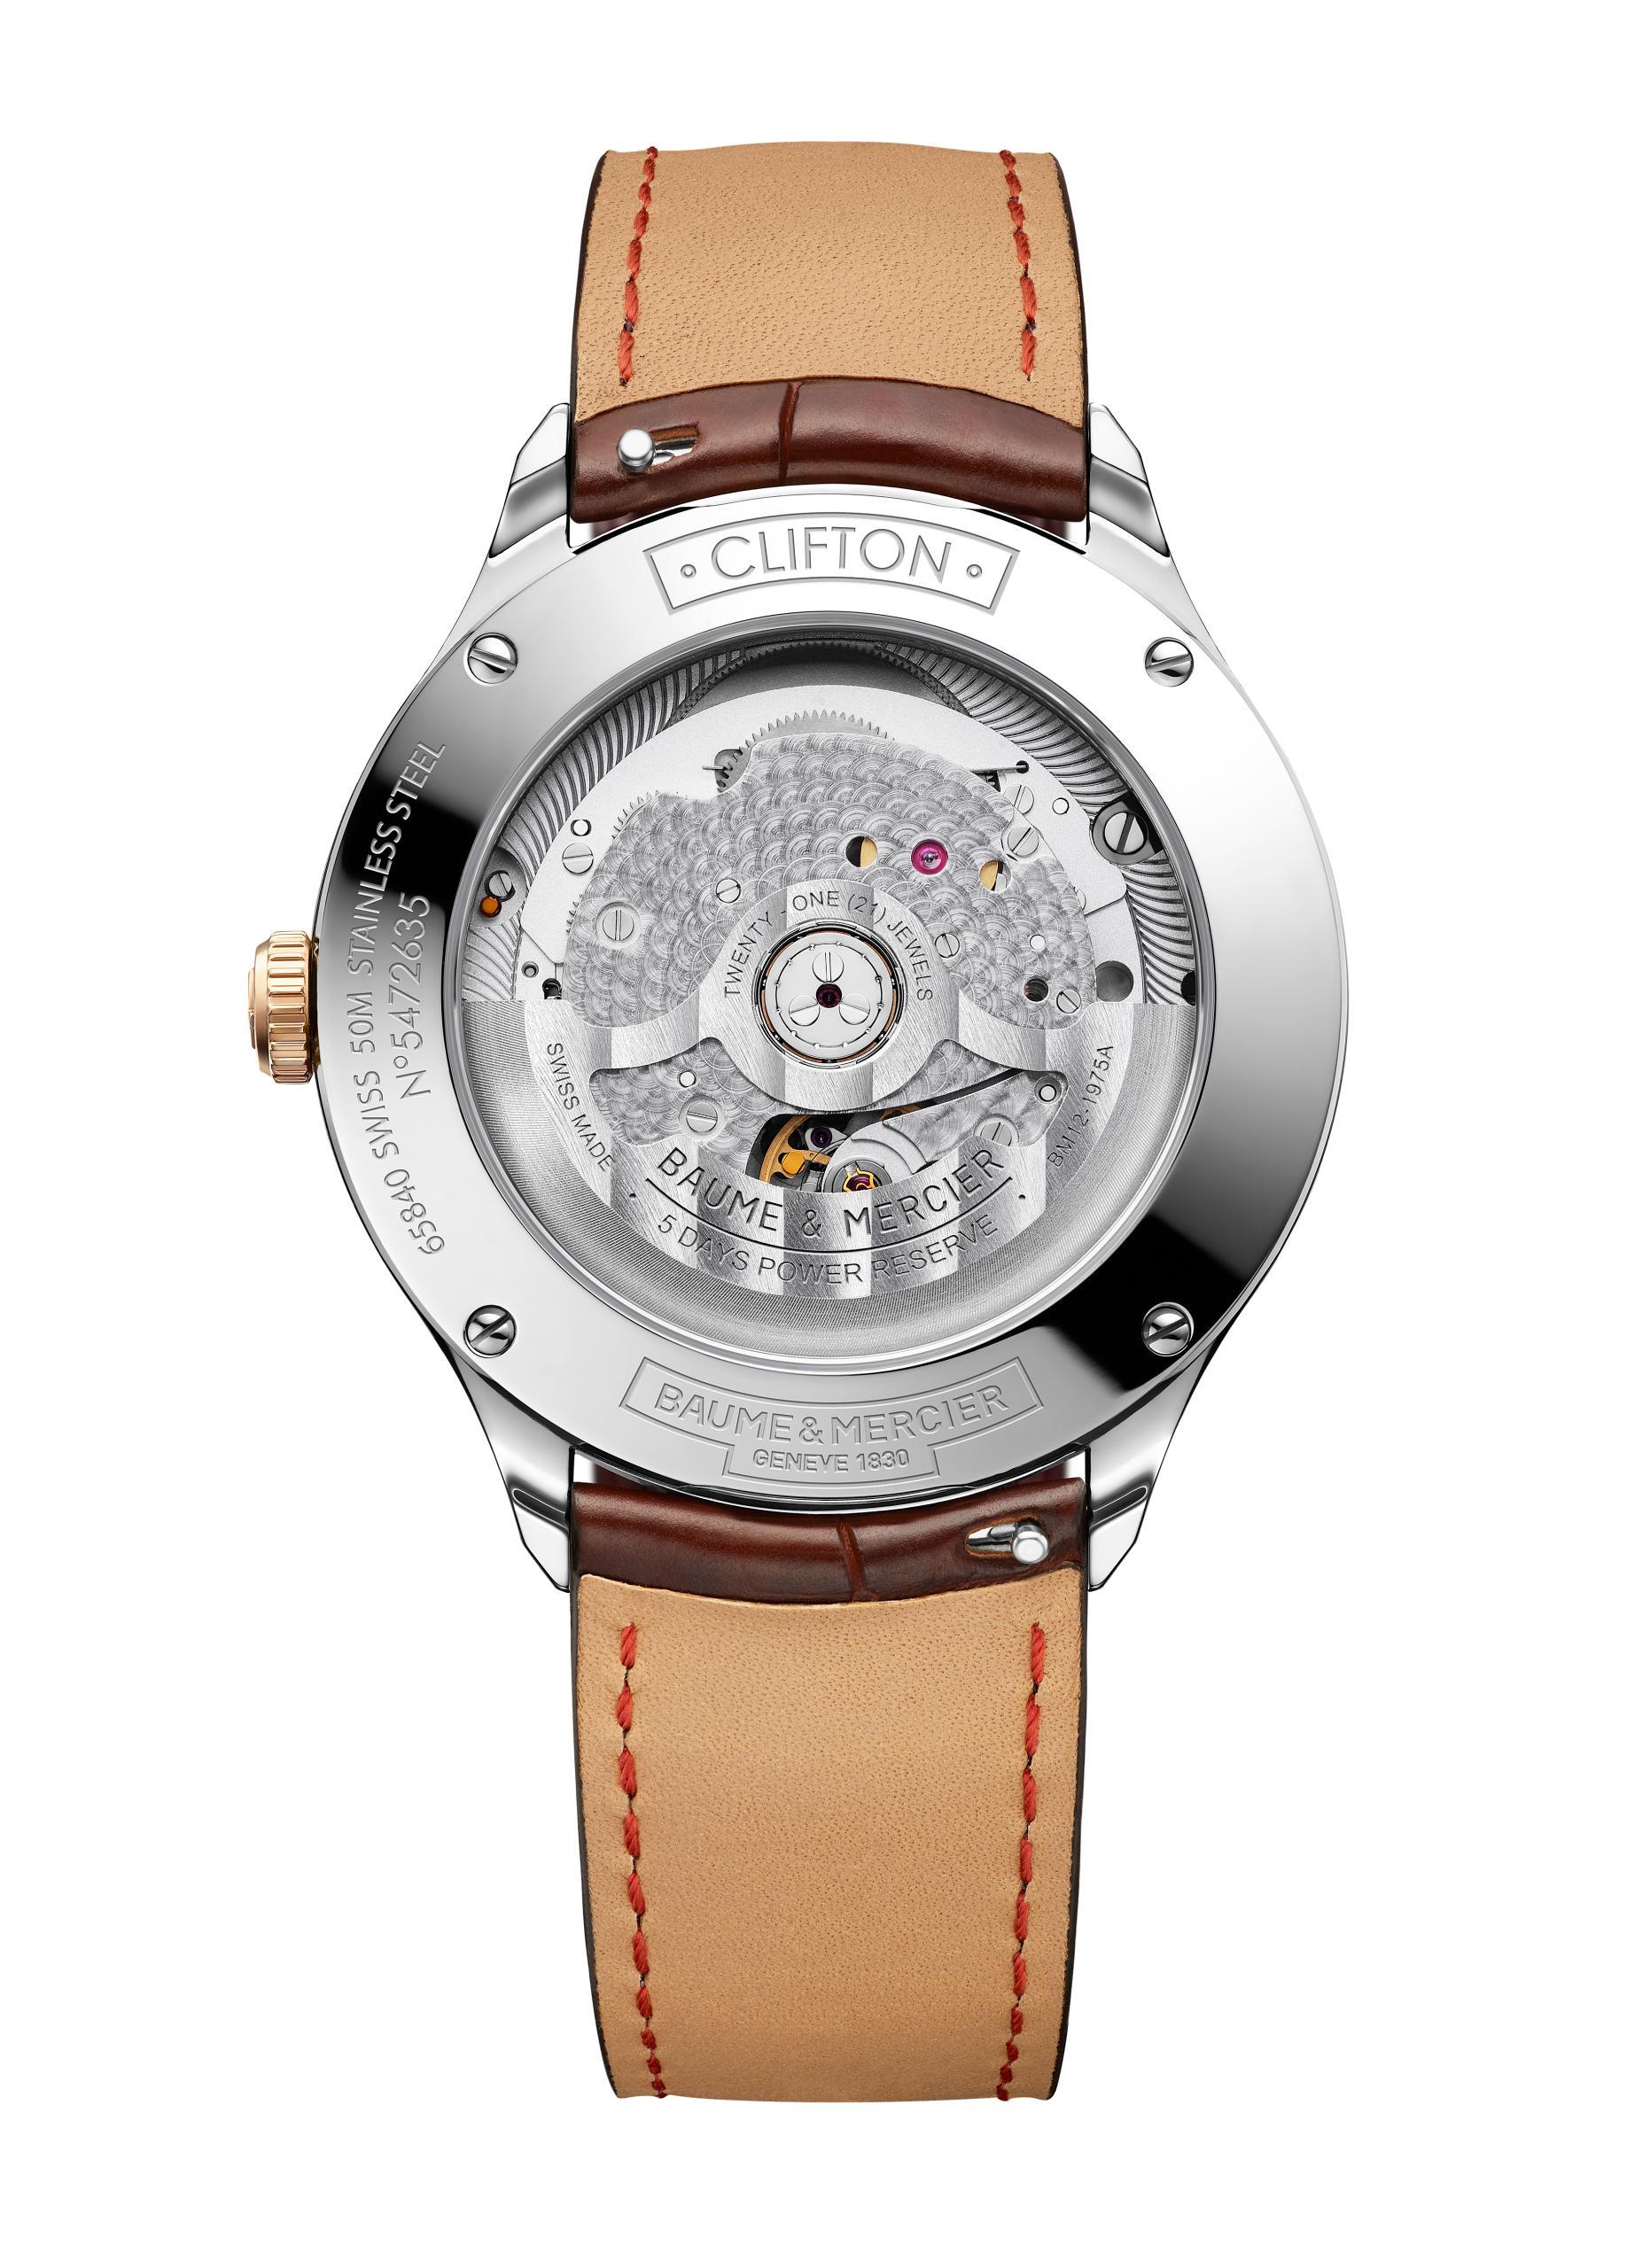 Baume & Mercier Clifton Baumatic watch